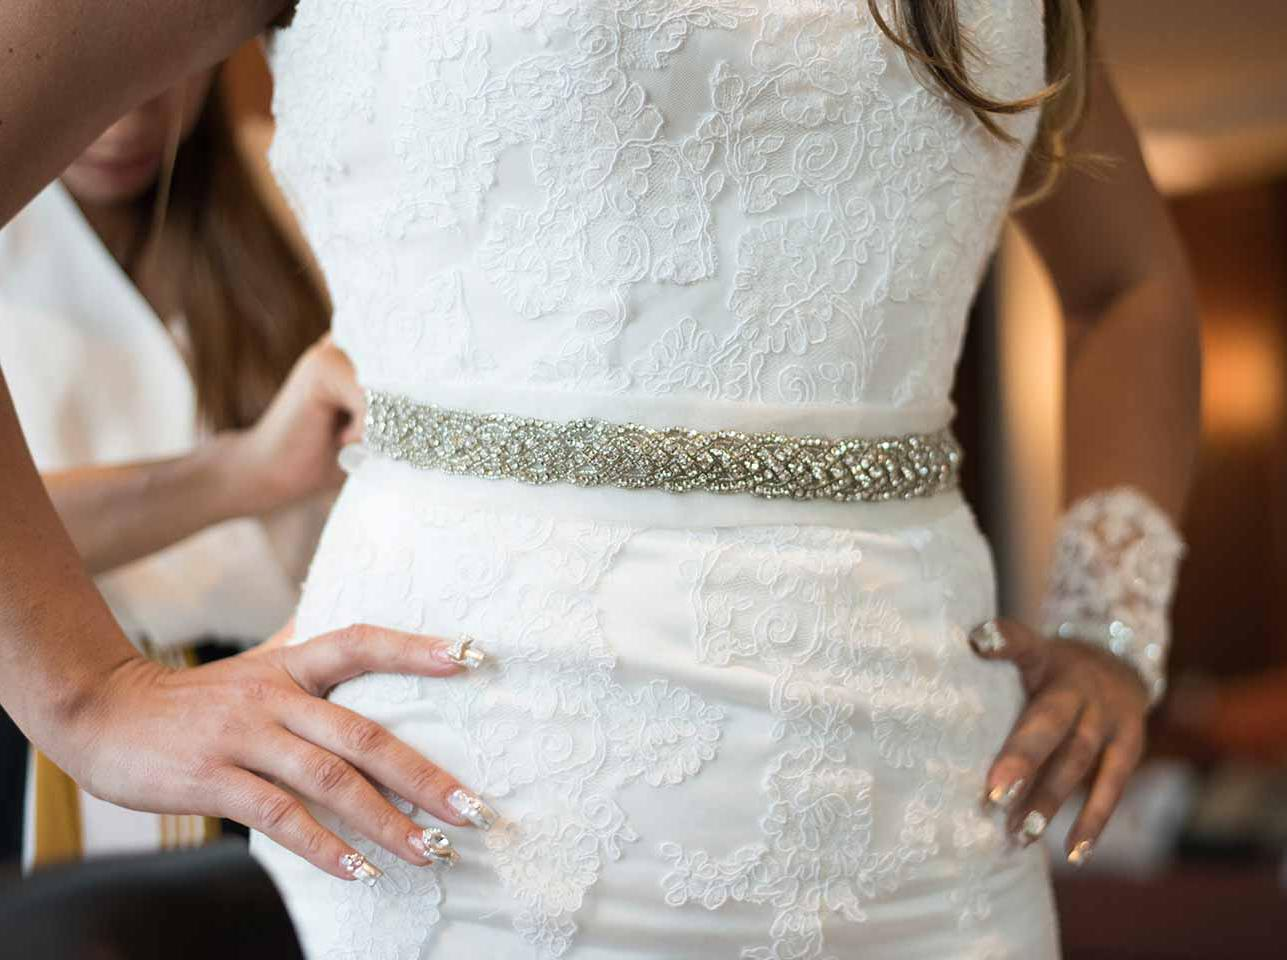 bodas-sin-clasificar-sin-tema-cuba-33291.jpg